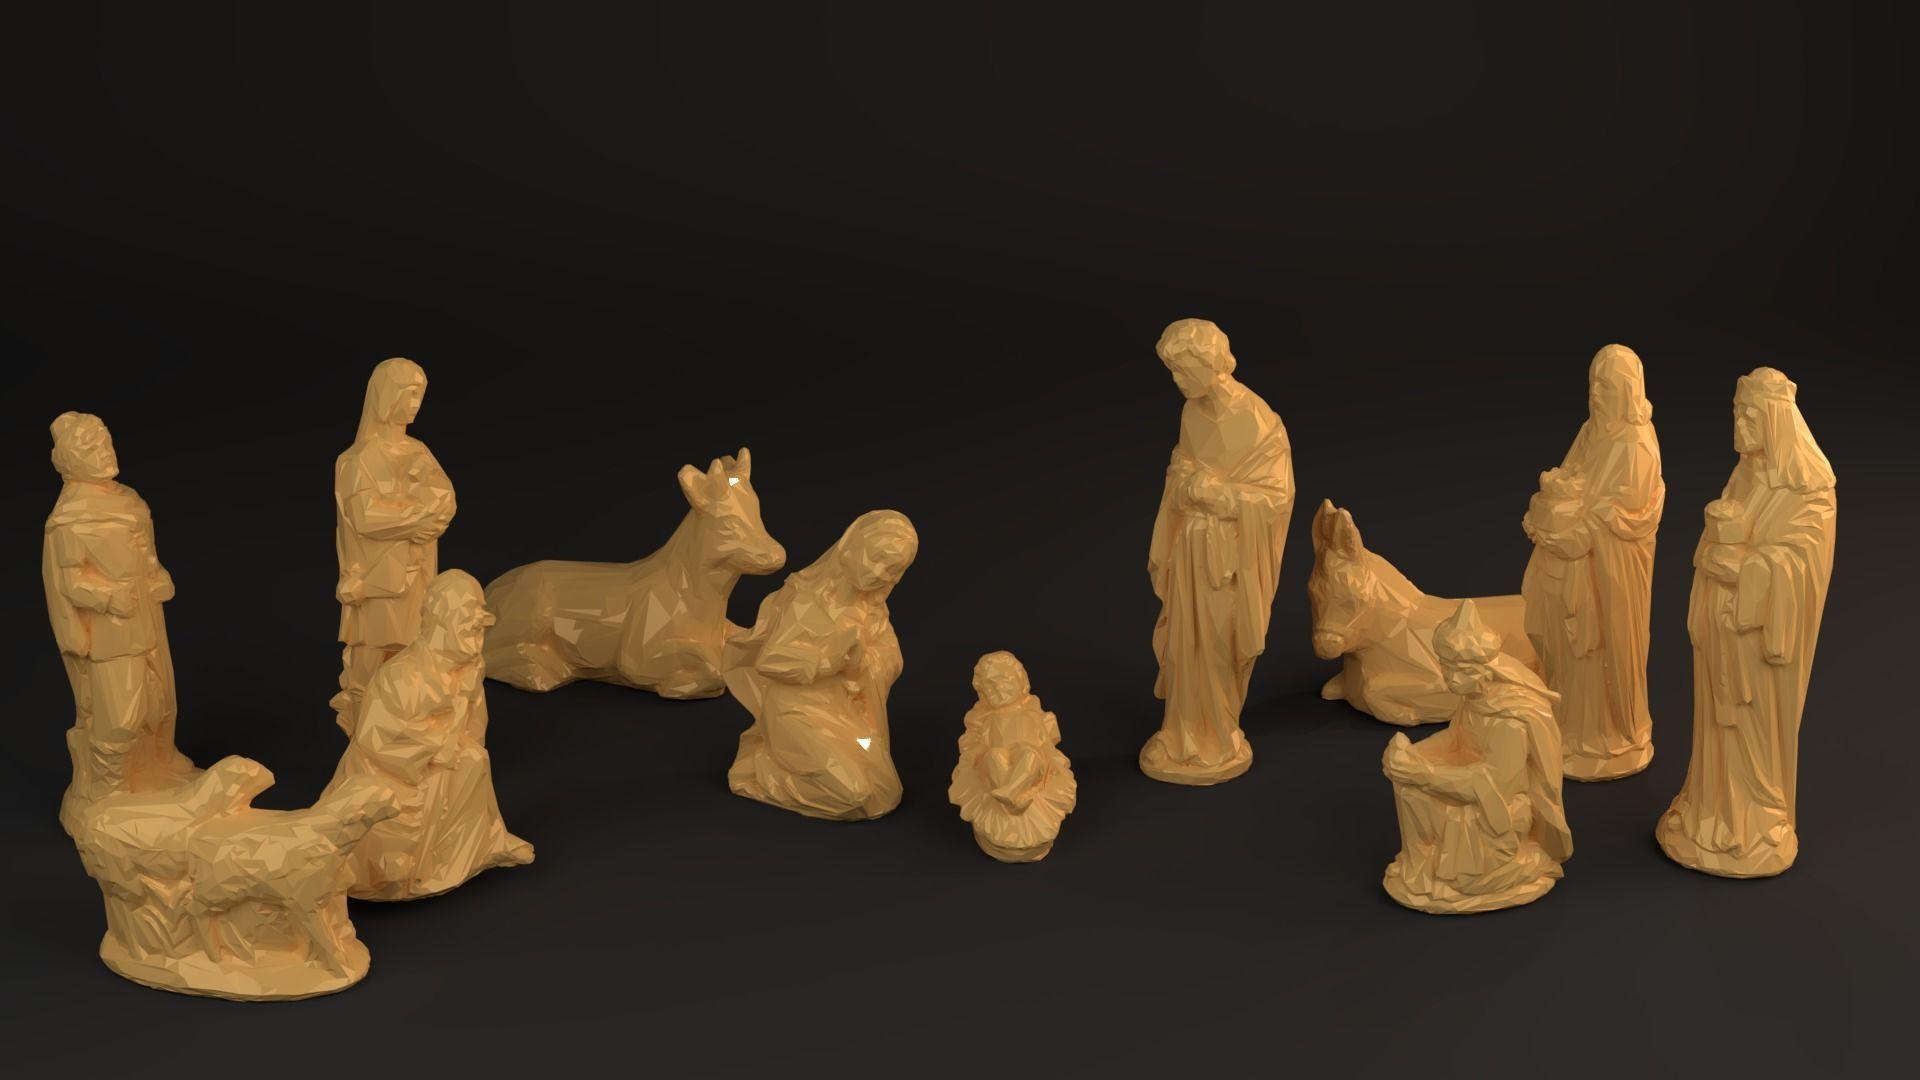 Nativity Crib figures - Low Poly